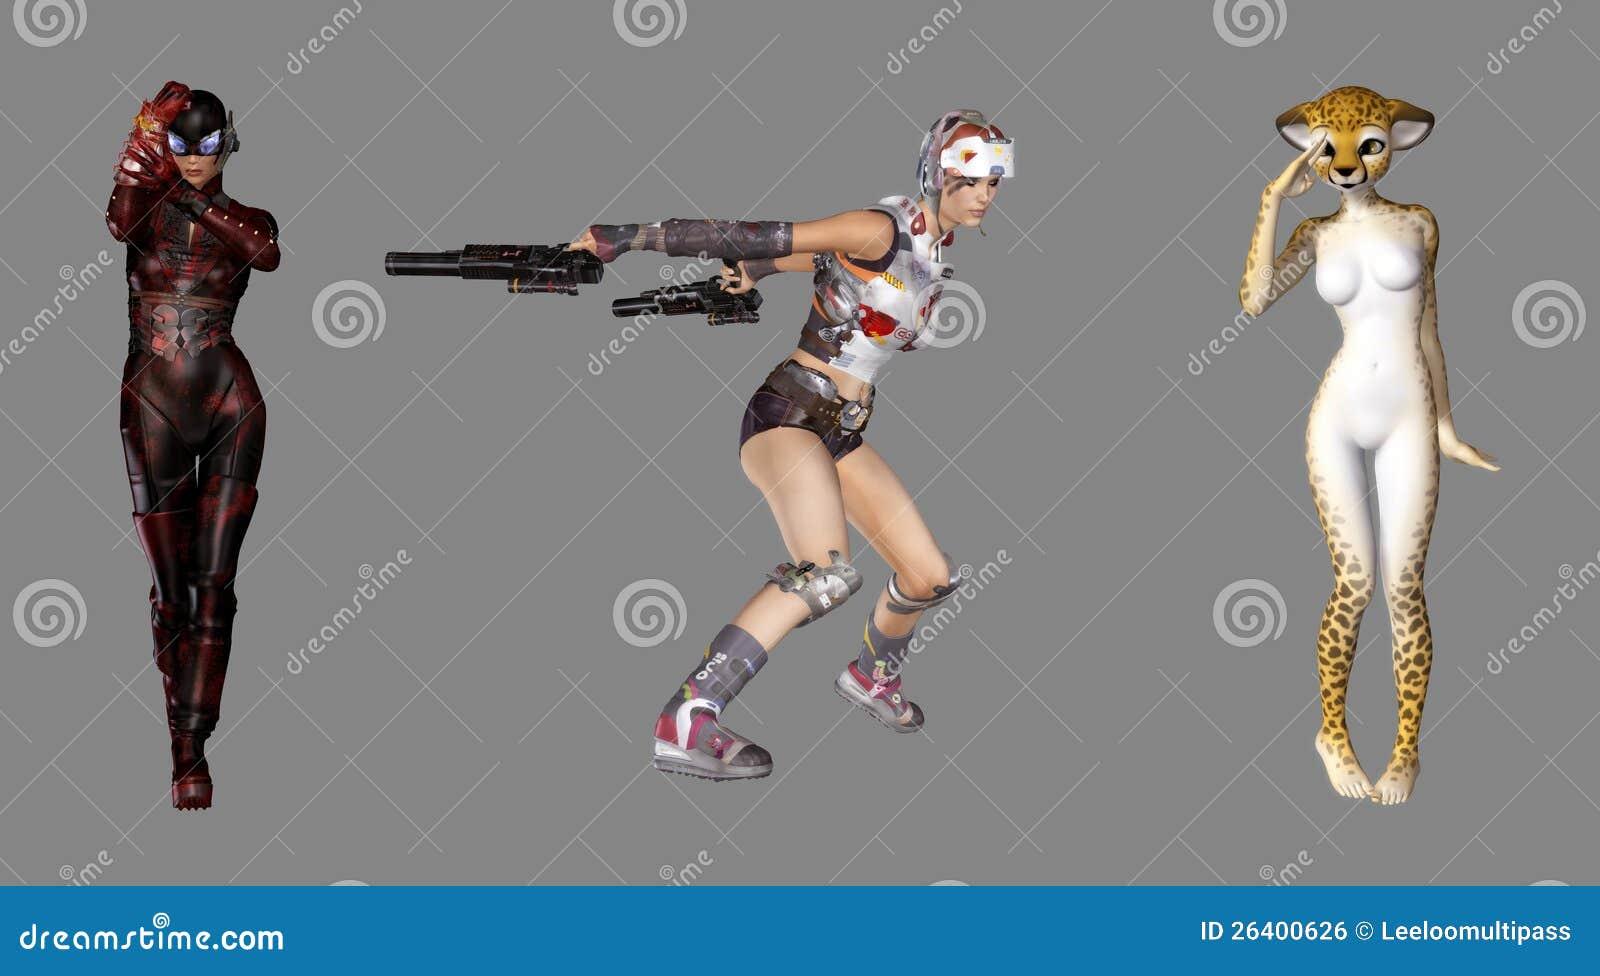 Digital Fantasy Characters